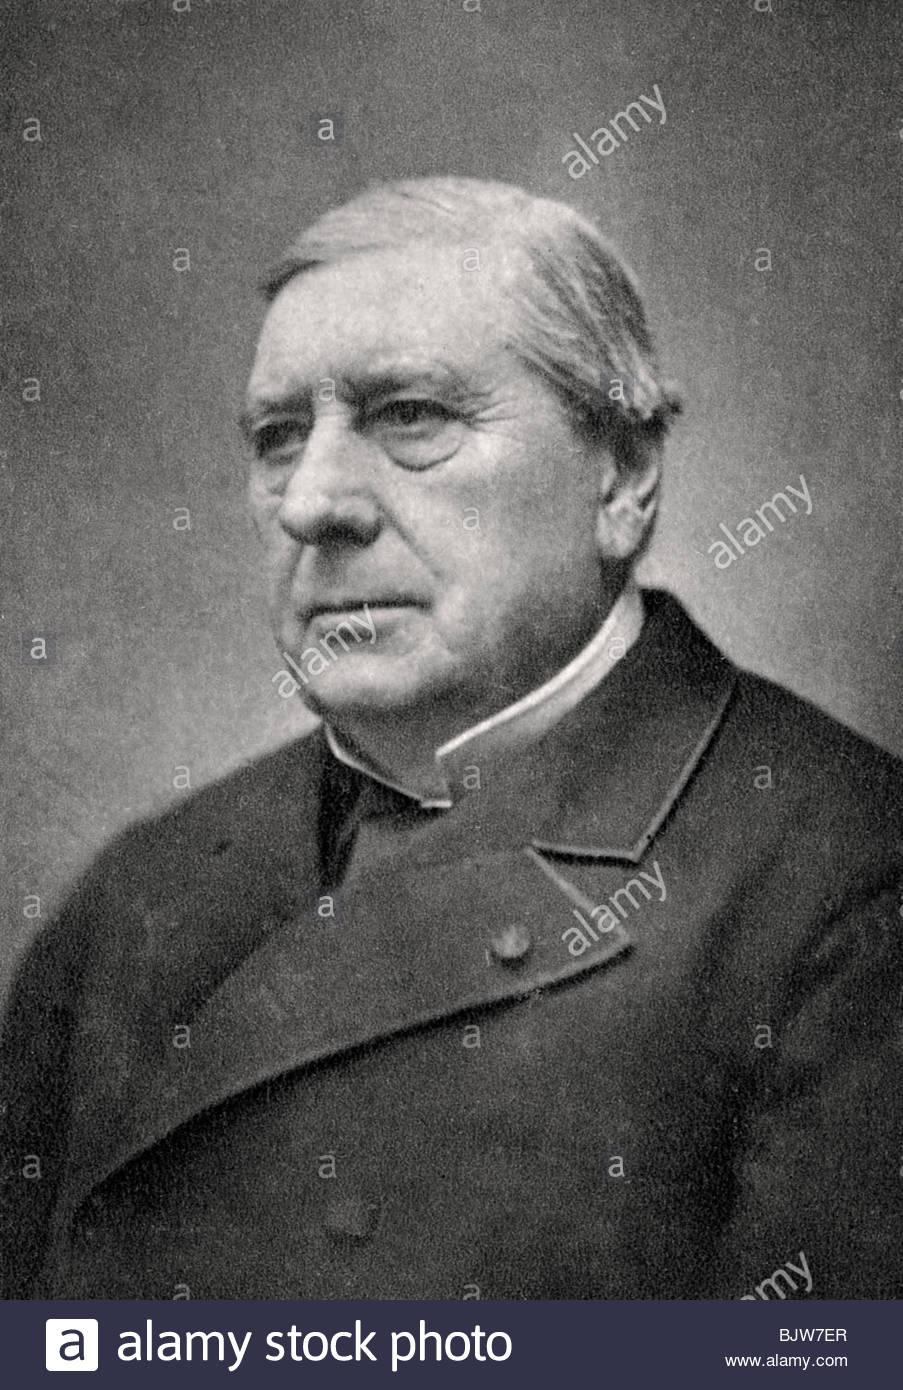 Eugene Labiche dirigido Marín, el dramaturgo francés, 1879. Imagen De Stock